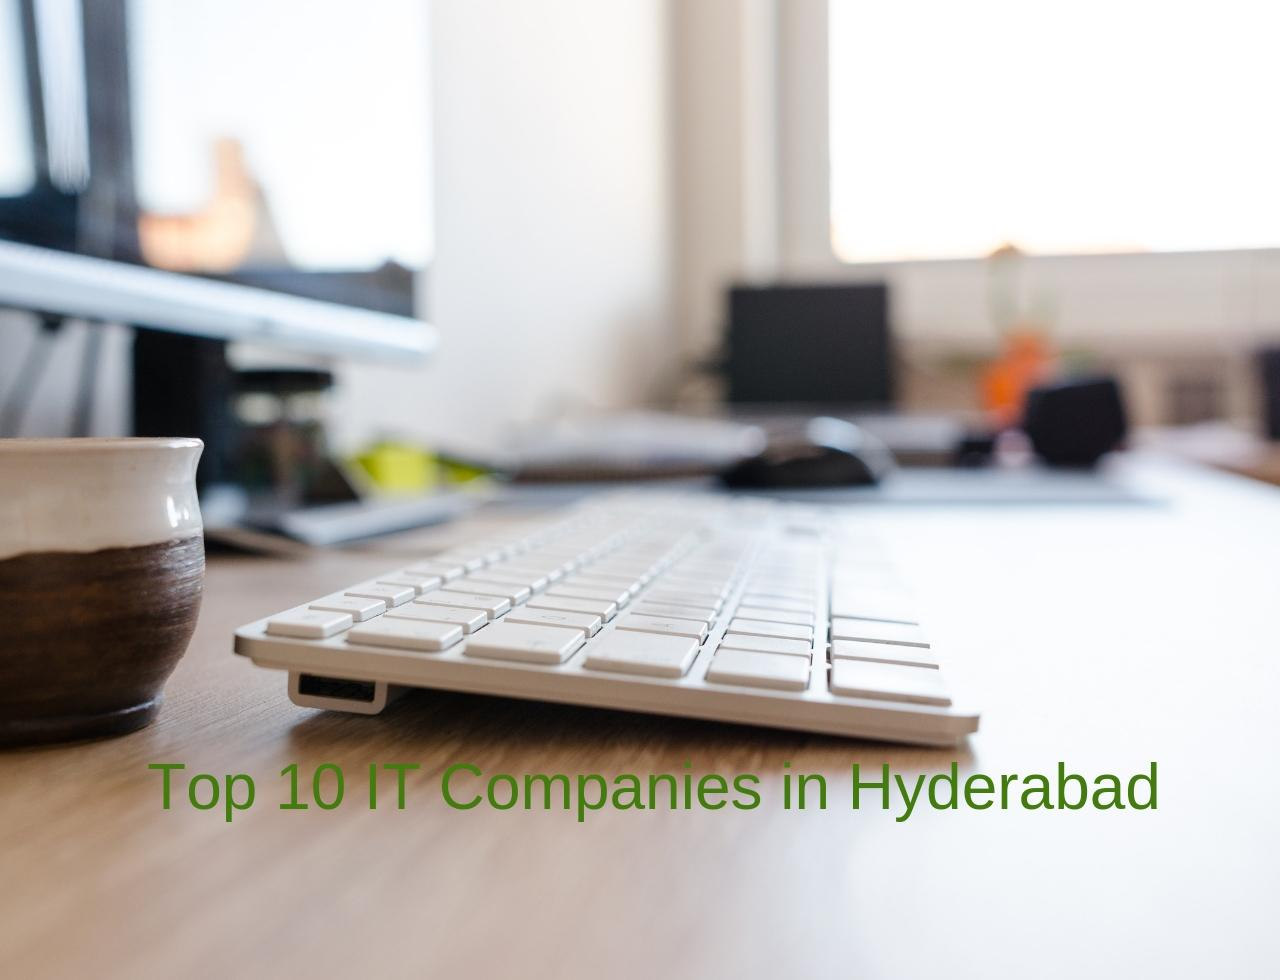 Top 10 IT Companies in Hyderabad